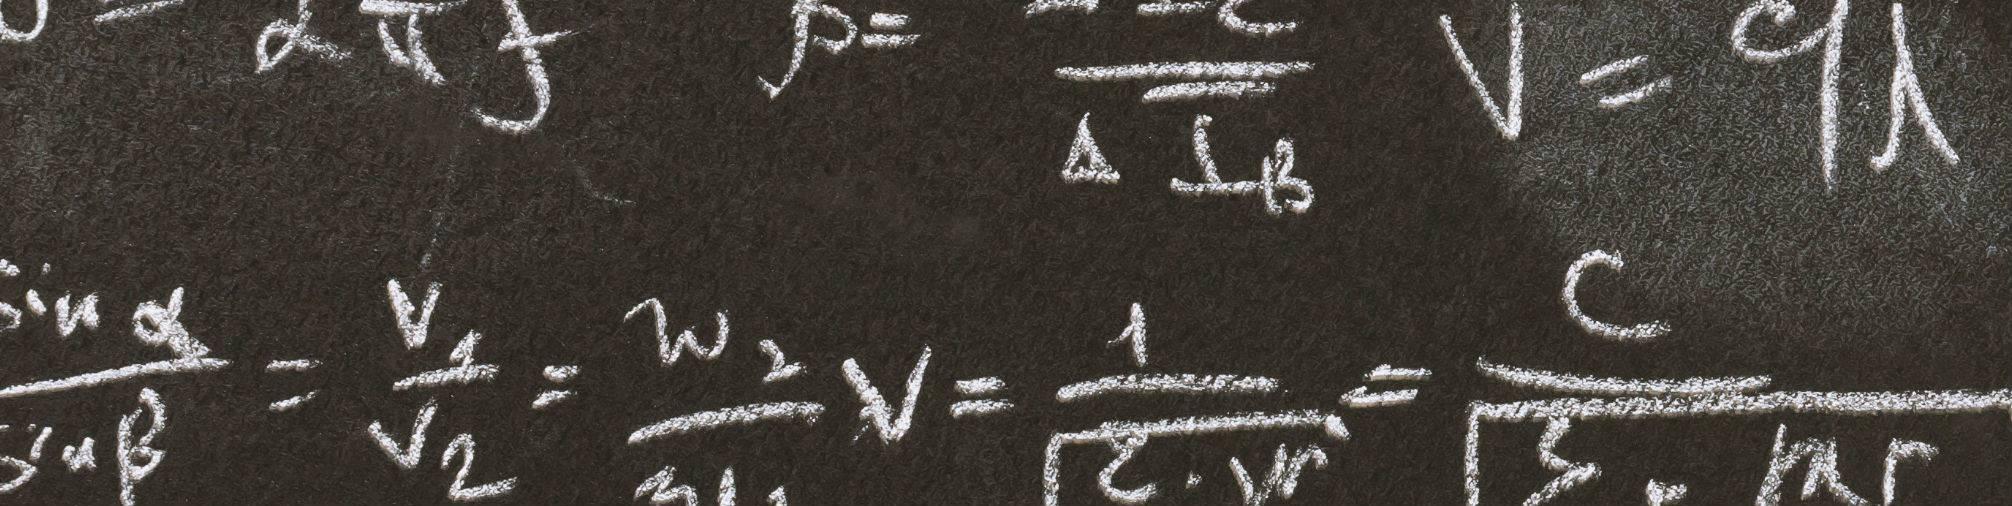 Formula on a blackboard